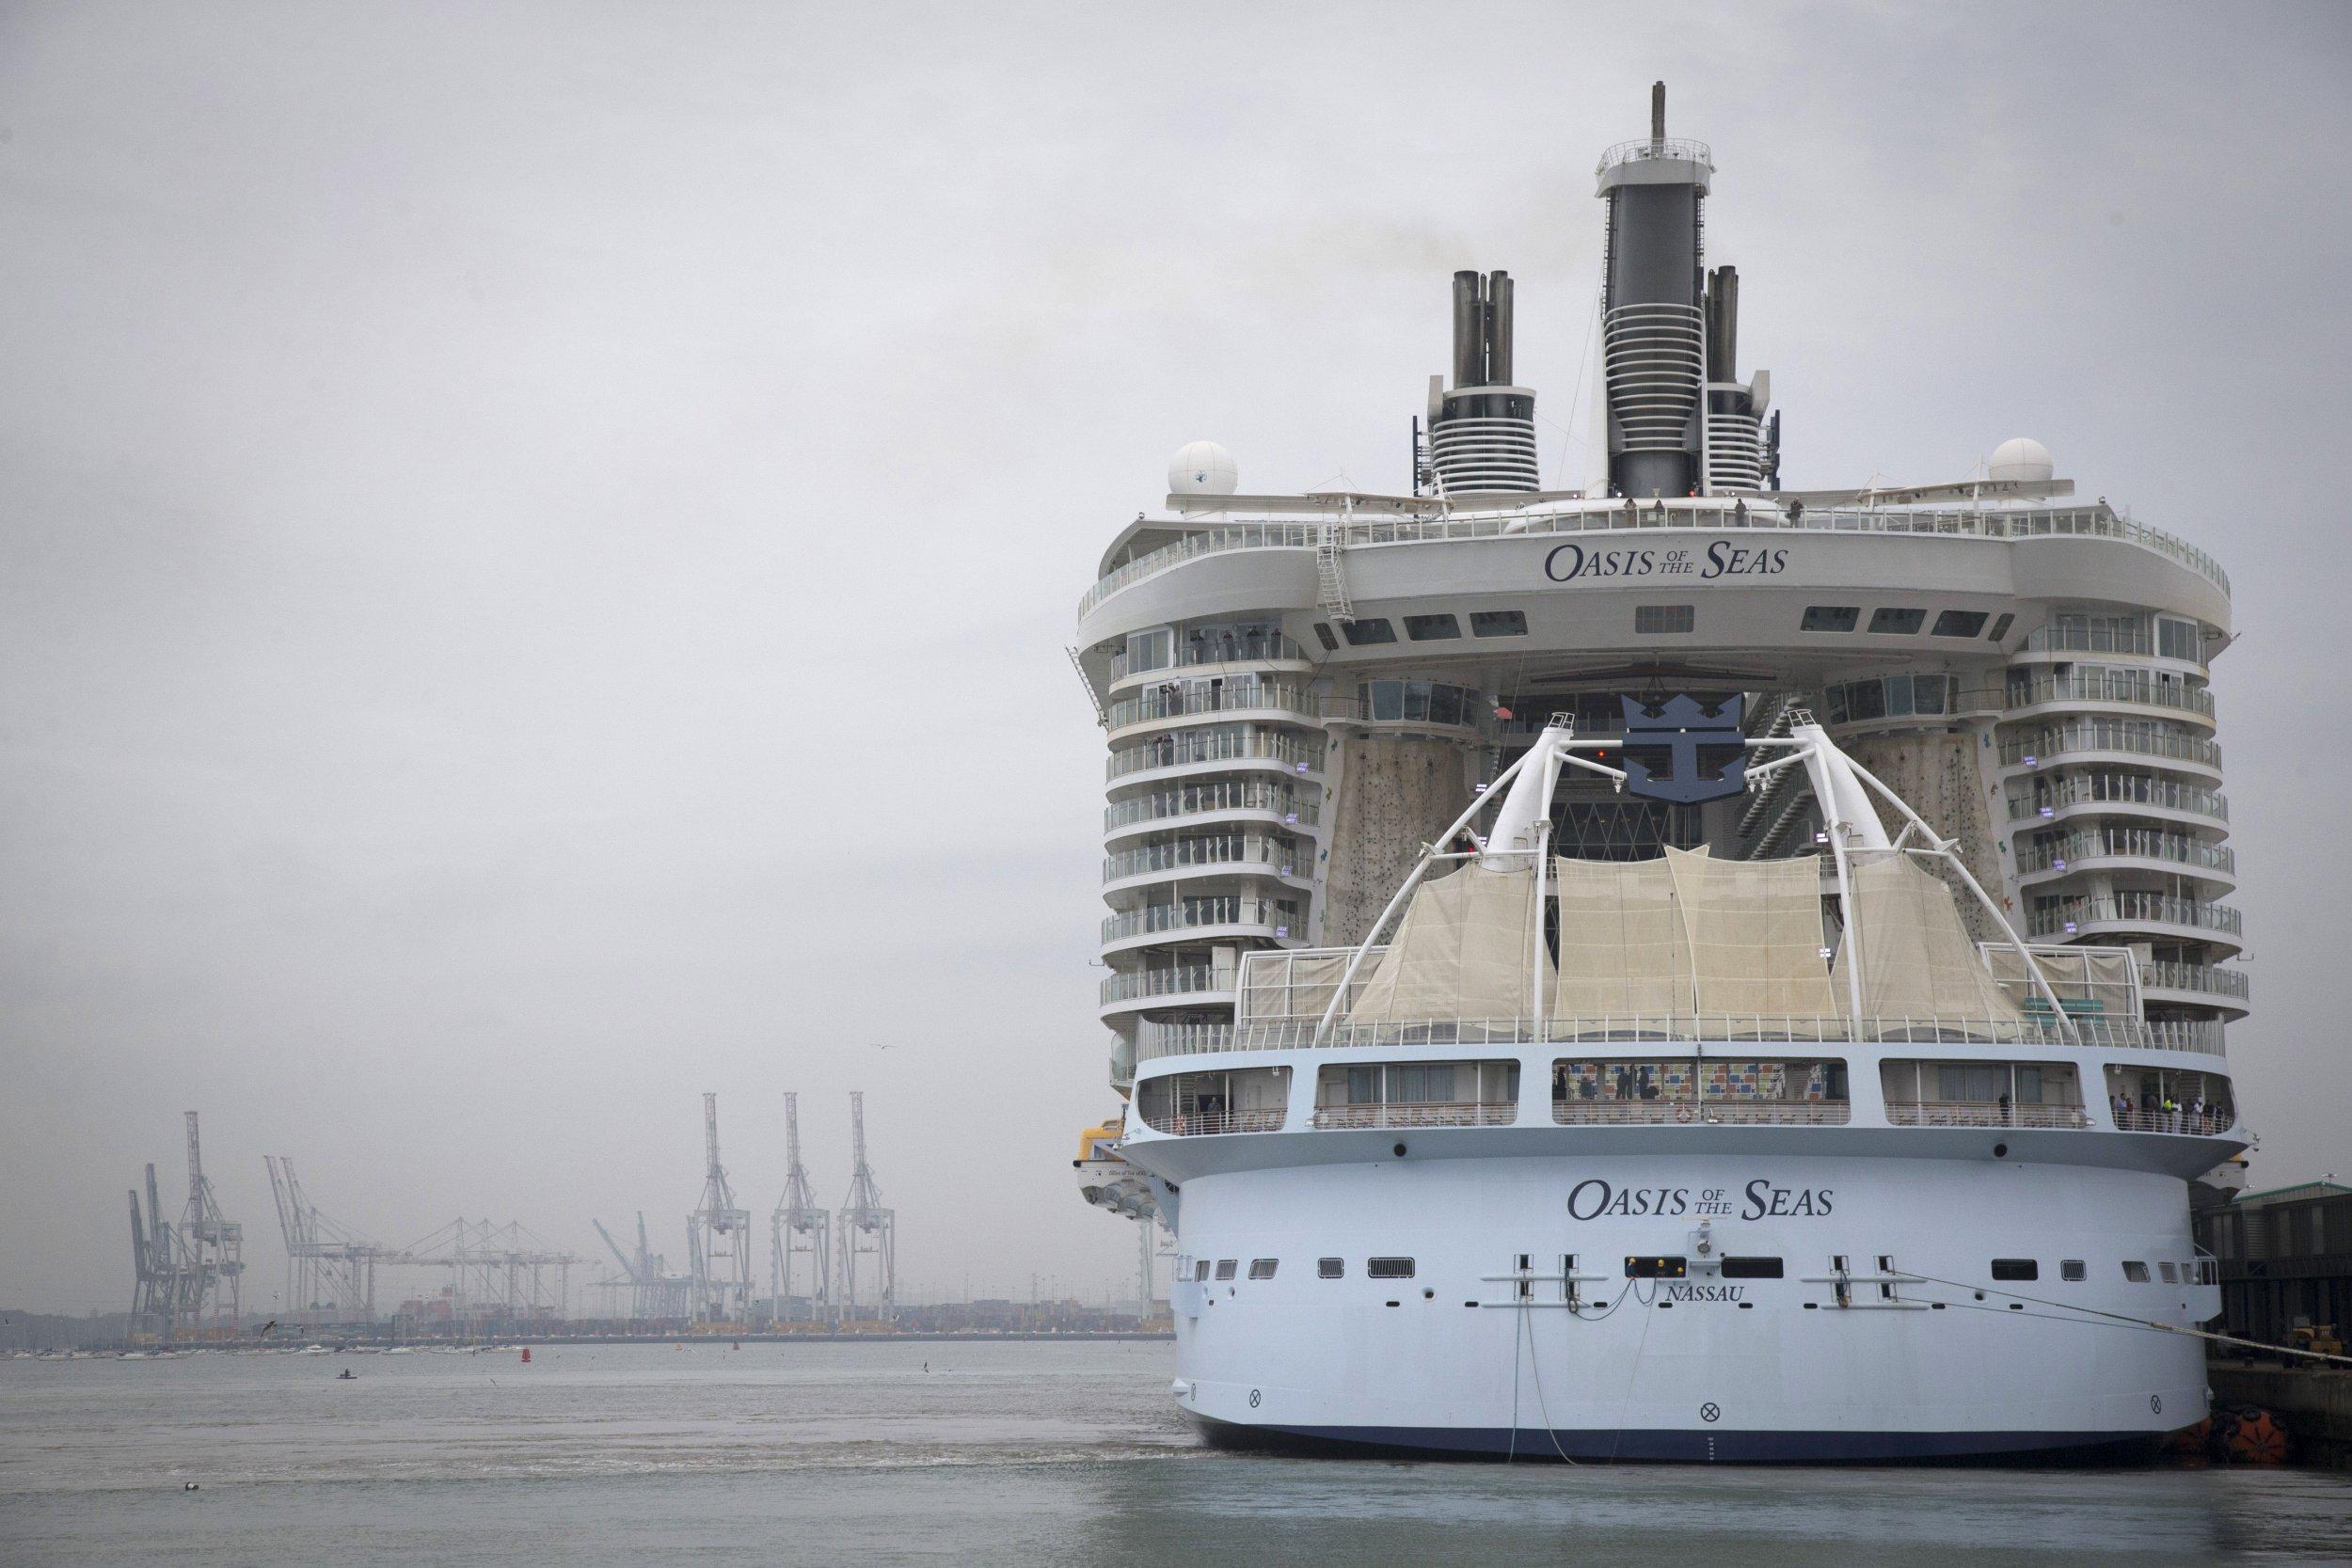 Cruise Ship, Norovirus, Vomiting, Nausea, Florida, Caribbean, Royal Caribbean